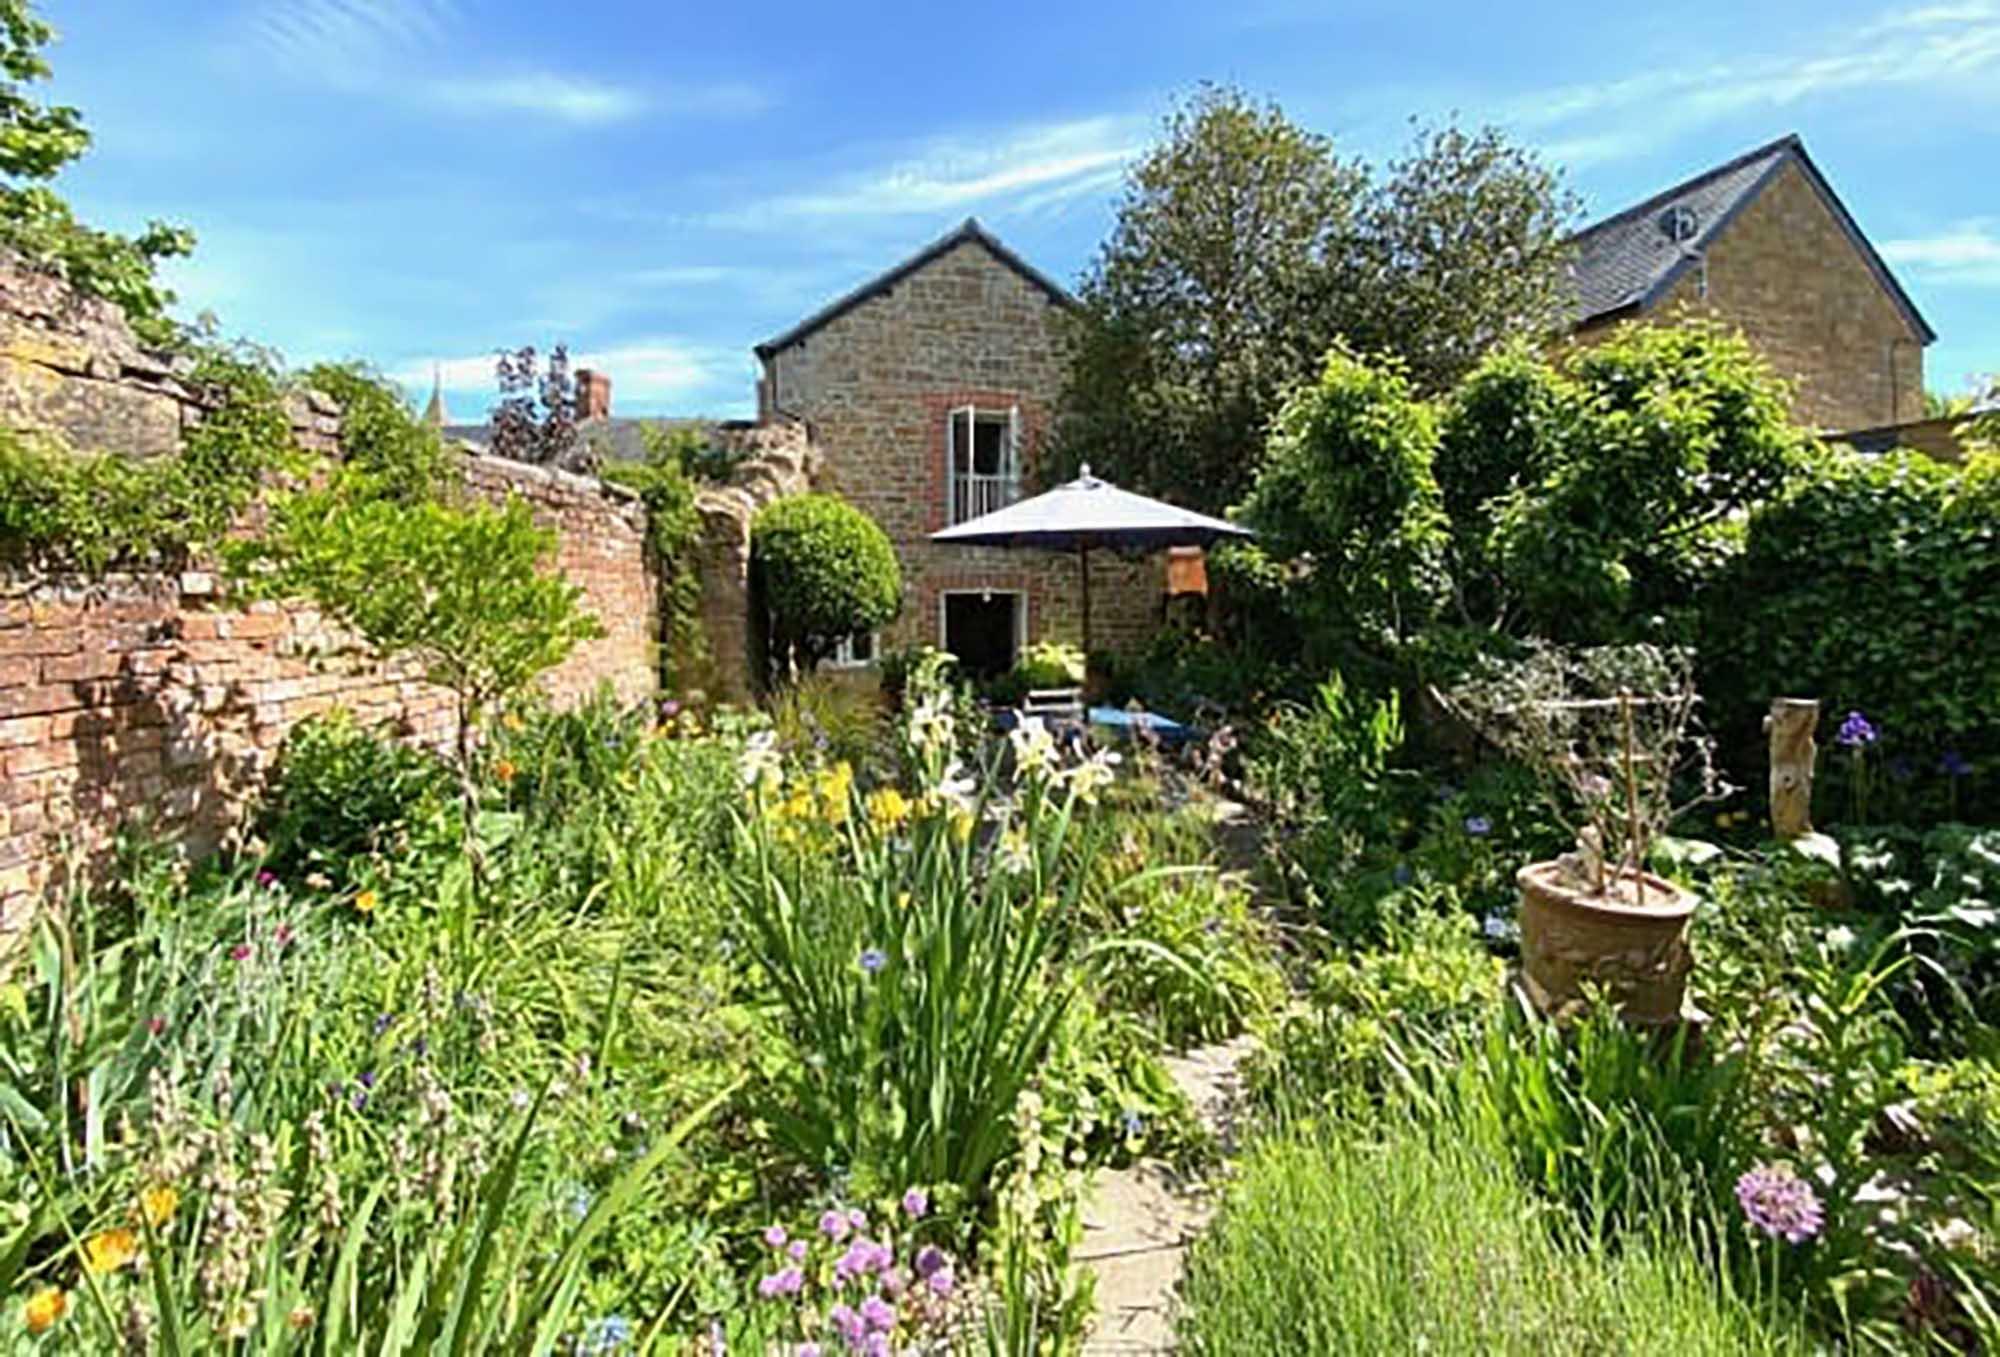 NO CHAIN. Cottage, 200 sq ft artists studio, centre of village